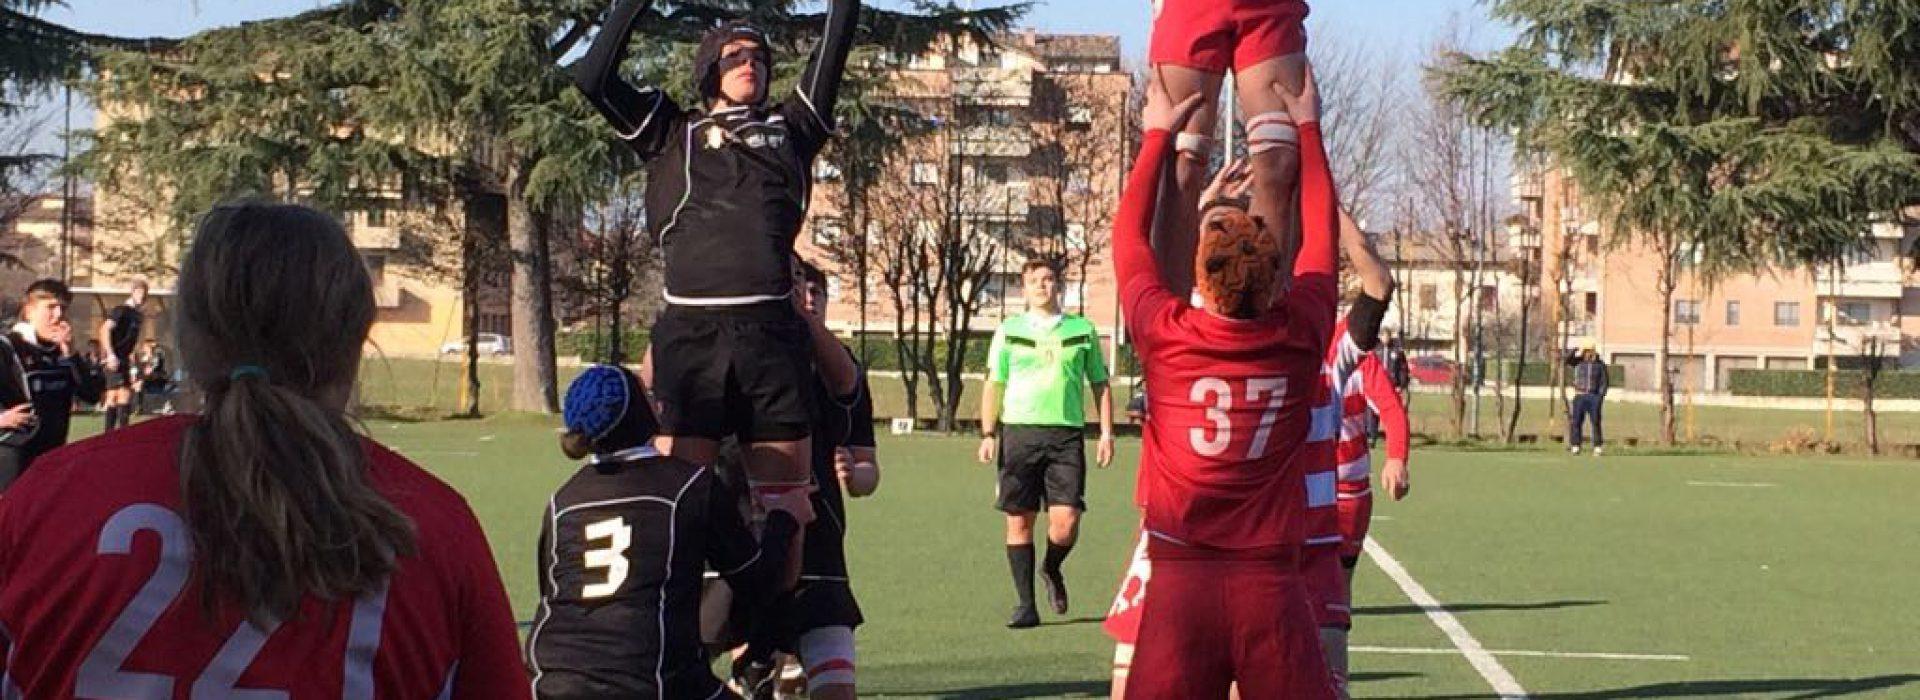 UNDICESIMO SUCCESSO IN CAMPIONATO PER L'UNDER 16 ELITE